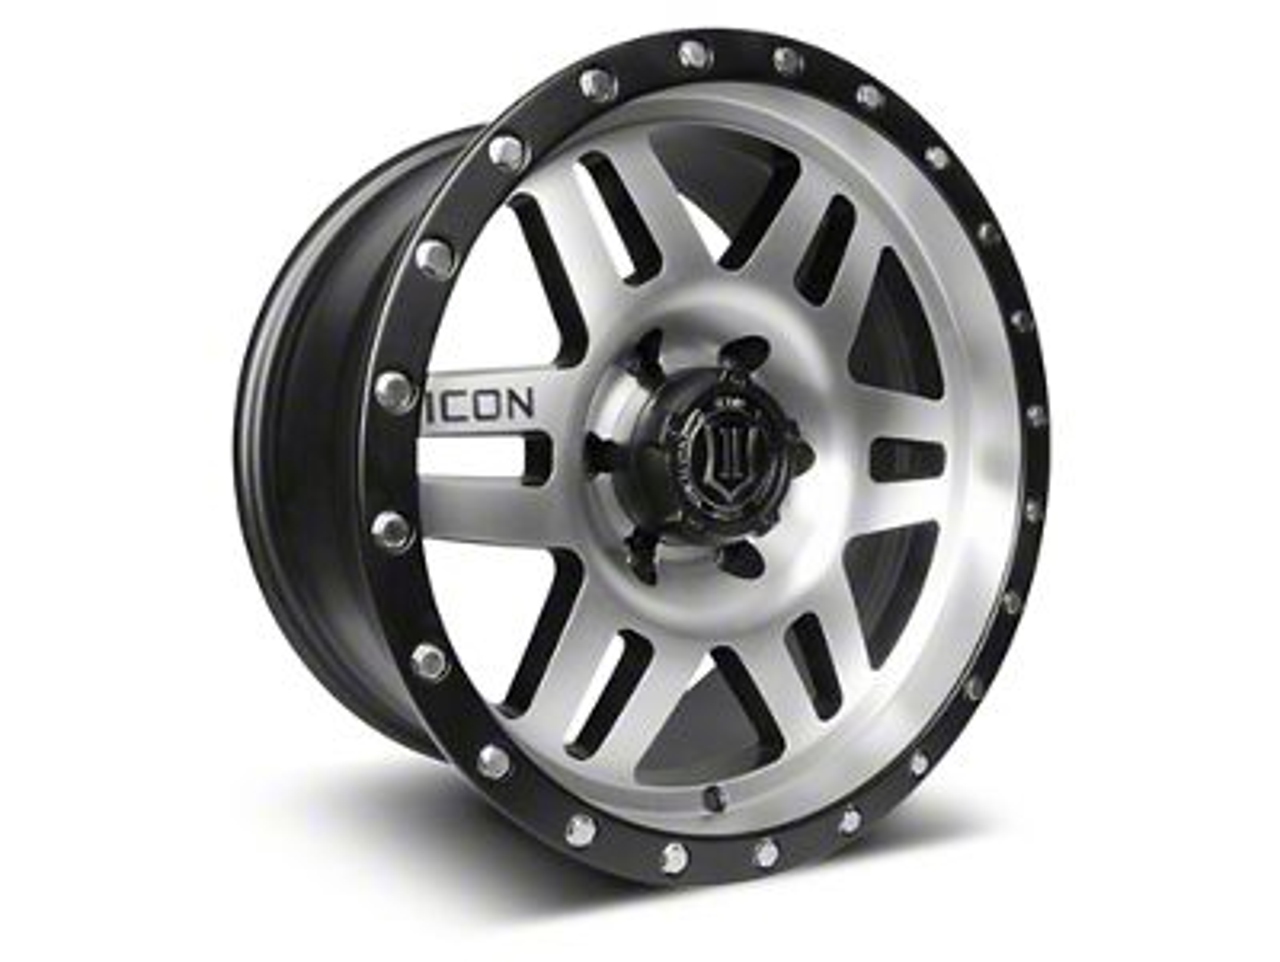 ICON Vehicle Dynamics Six Speed Satin Black Machined Wheel - 17x8.5 (07-18 Jeep Wrangler JK)